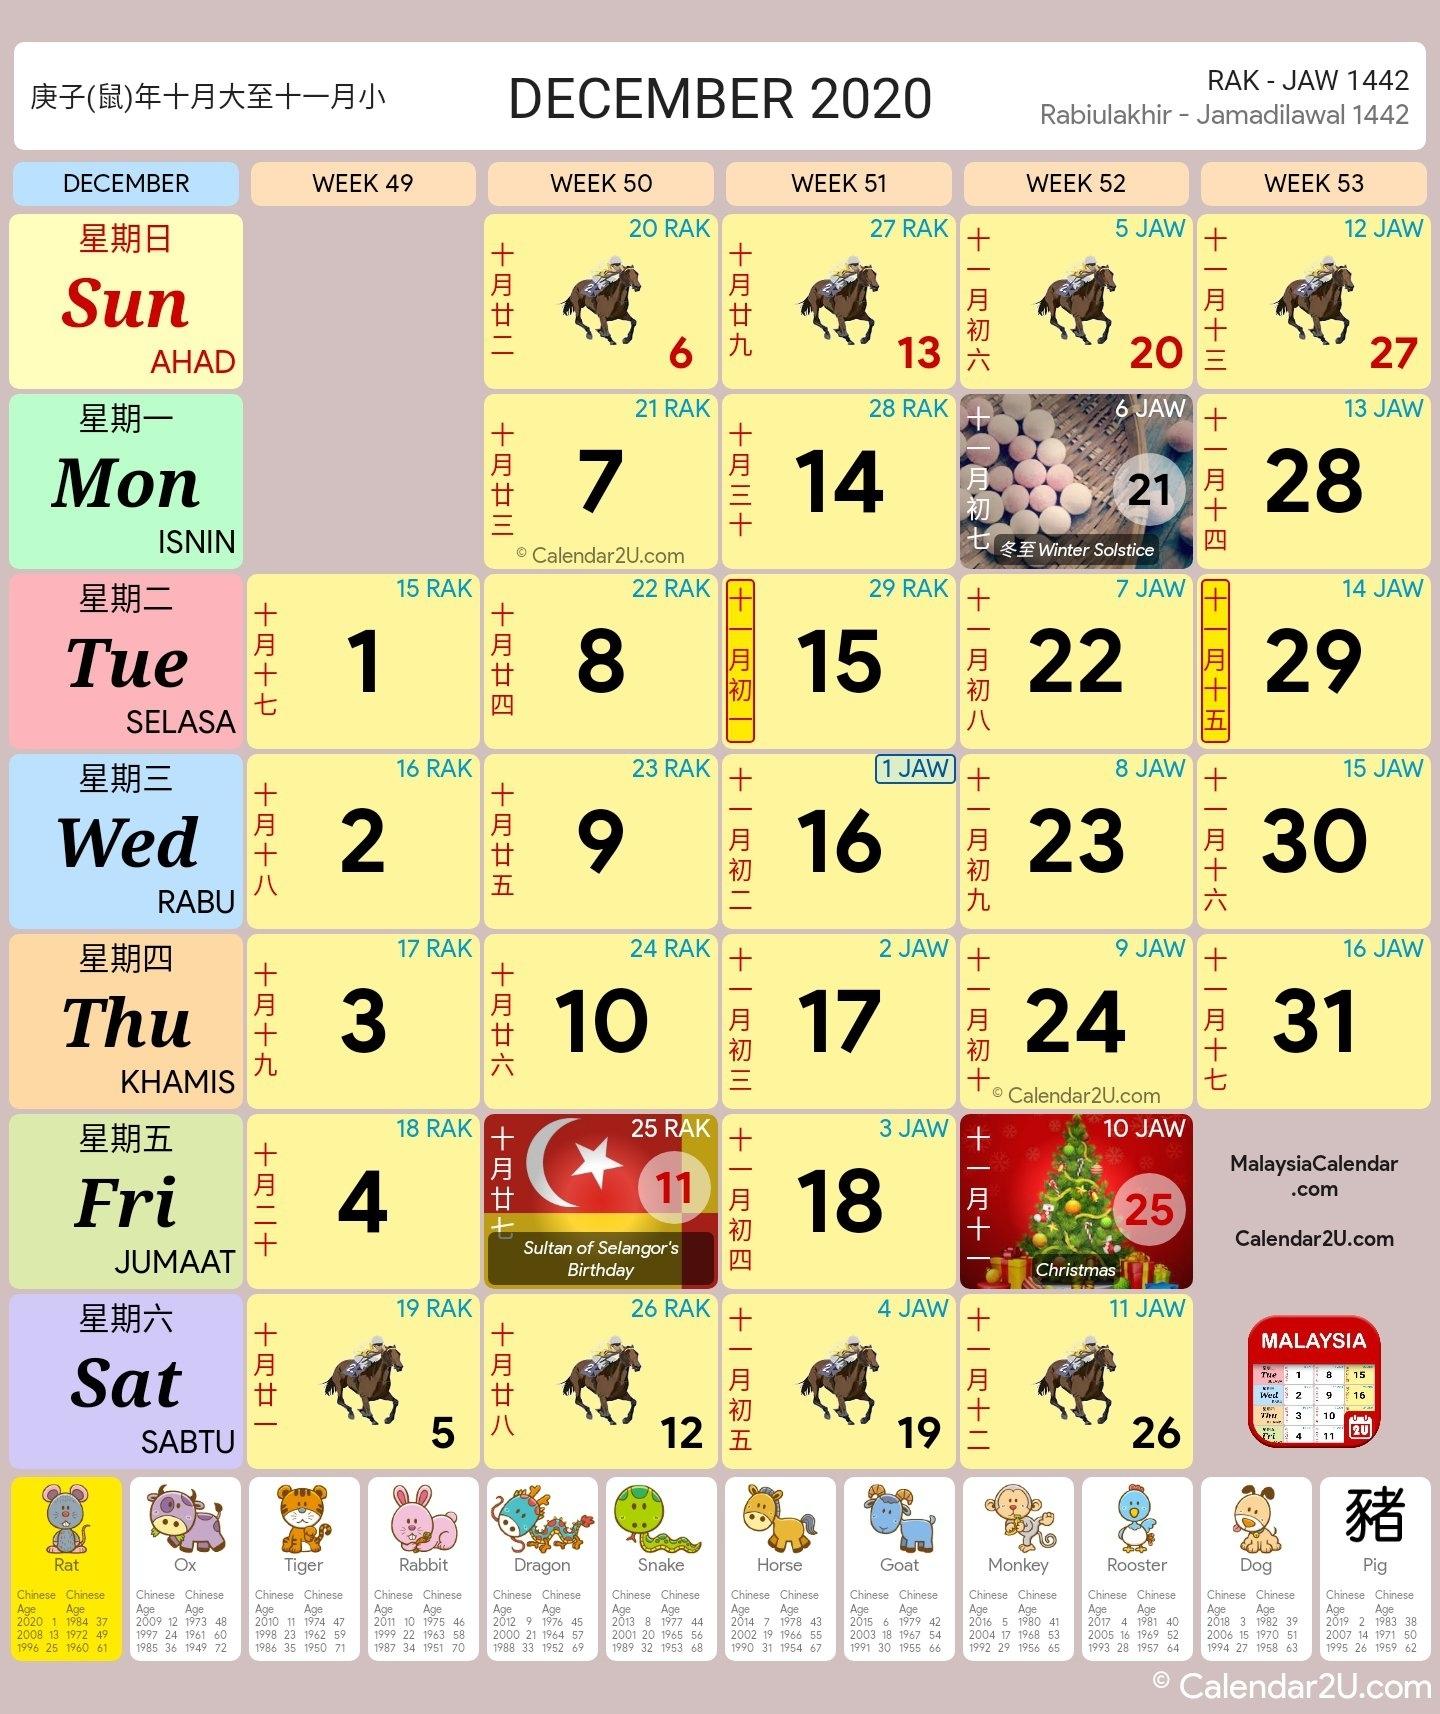 Malaysia Calendar Year 2020 (School Holiday) - Malaysia Calendar Remarkable Calendar 2020 Malaysia With School Holiday